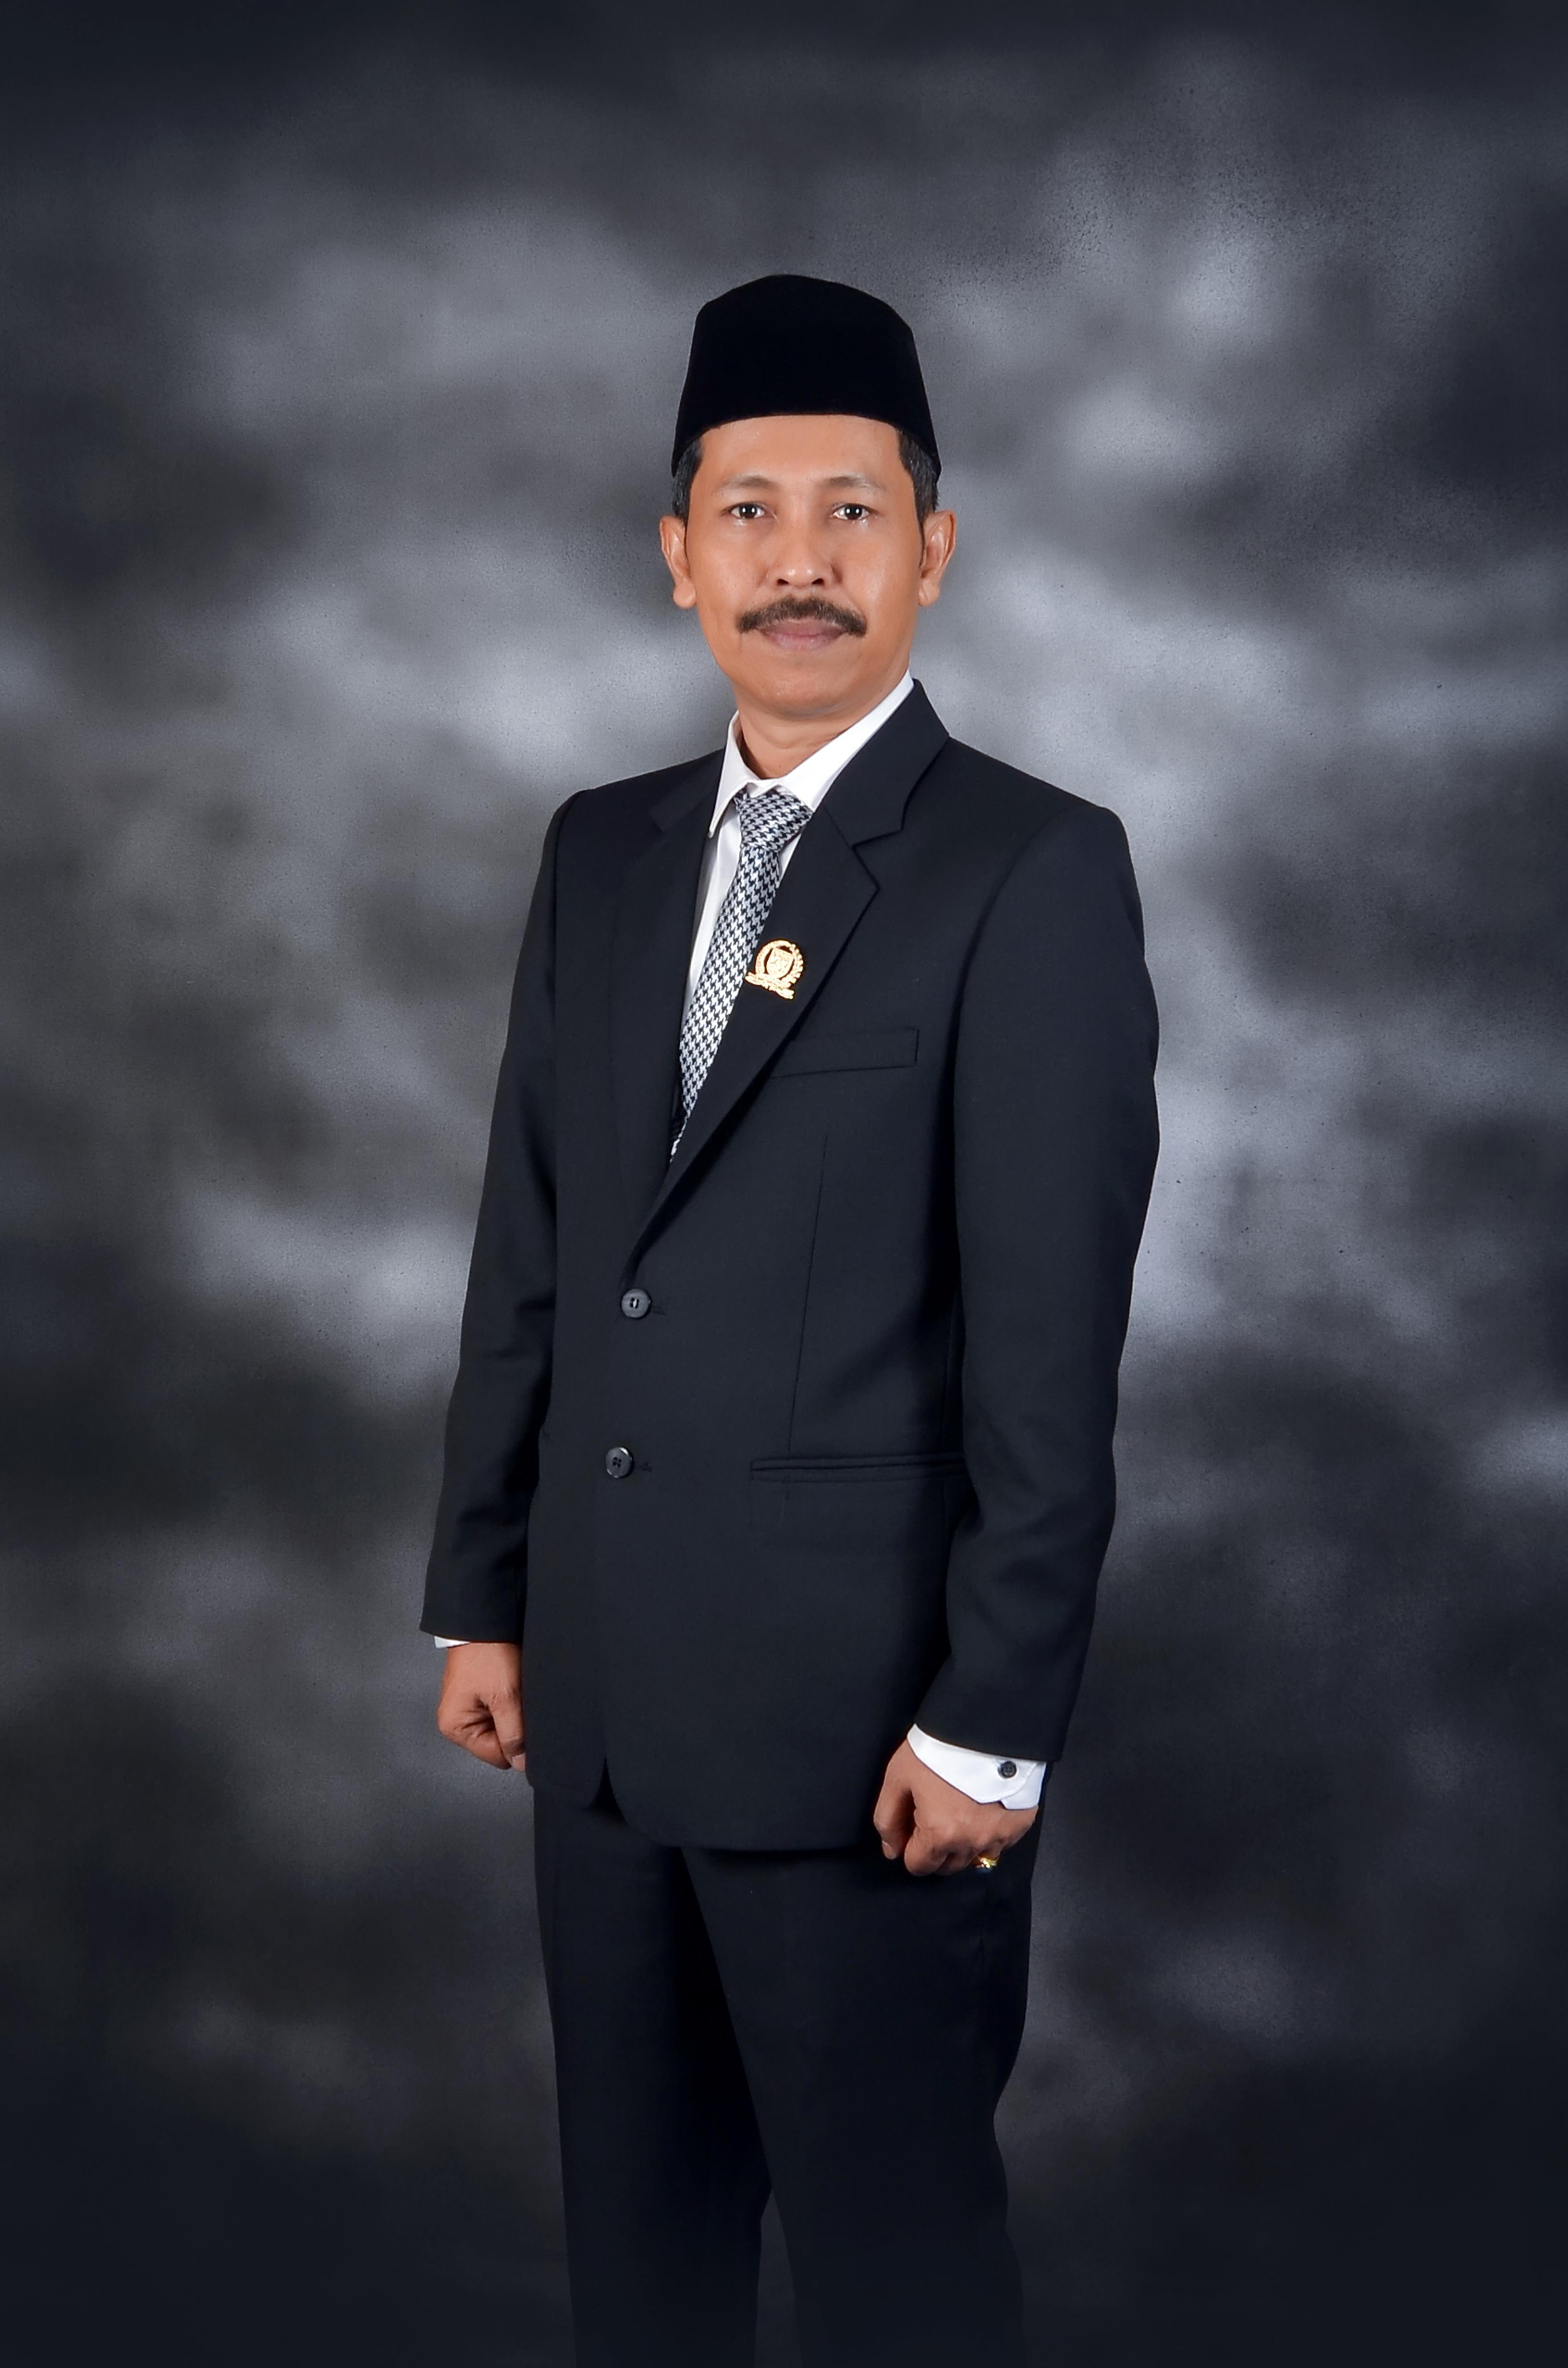 proses/admin/lampiran/89_muhammad_fahri.jpg